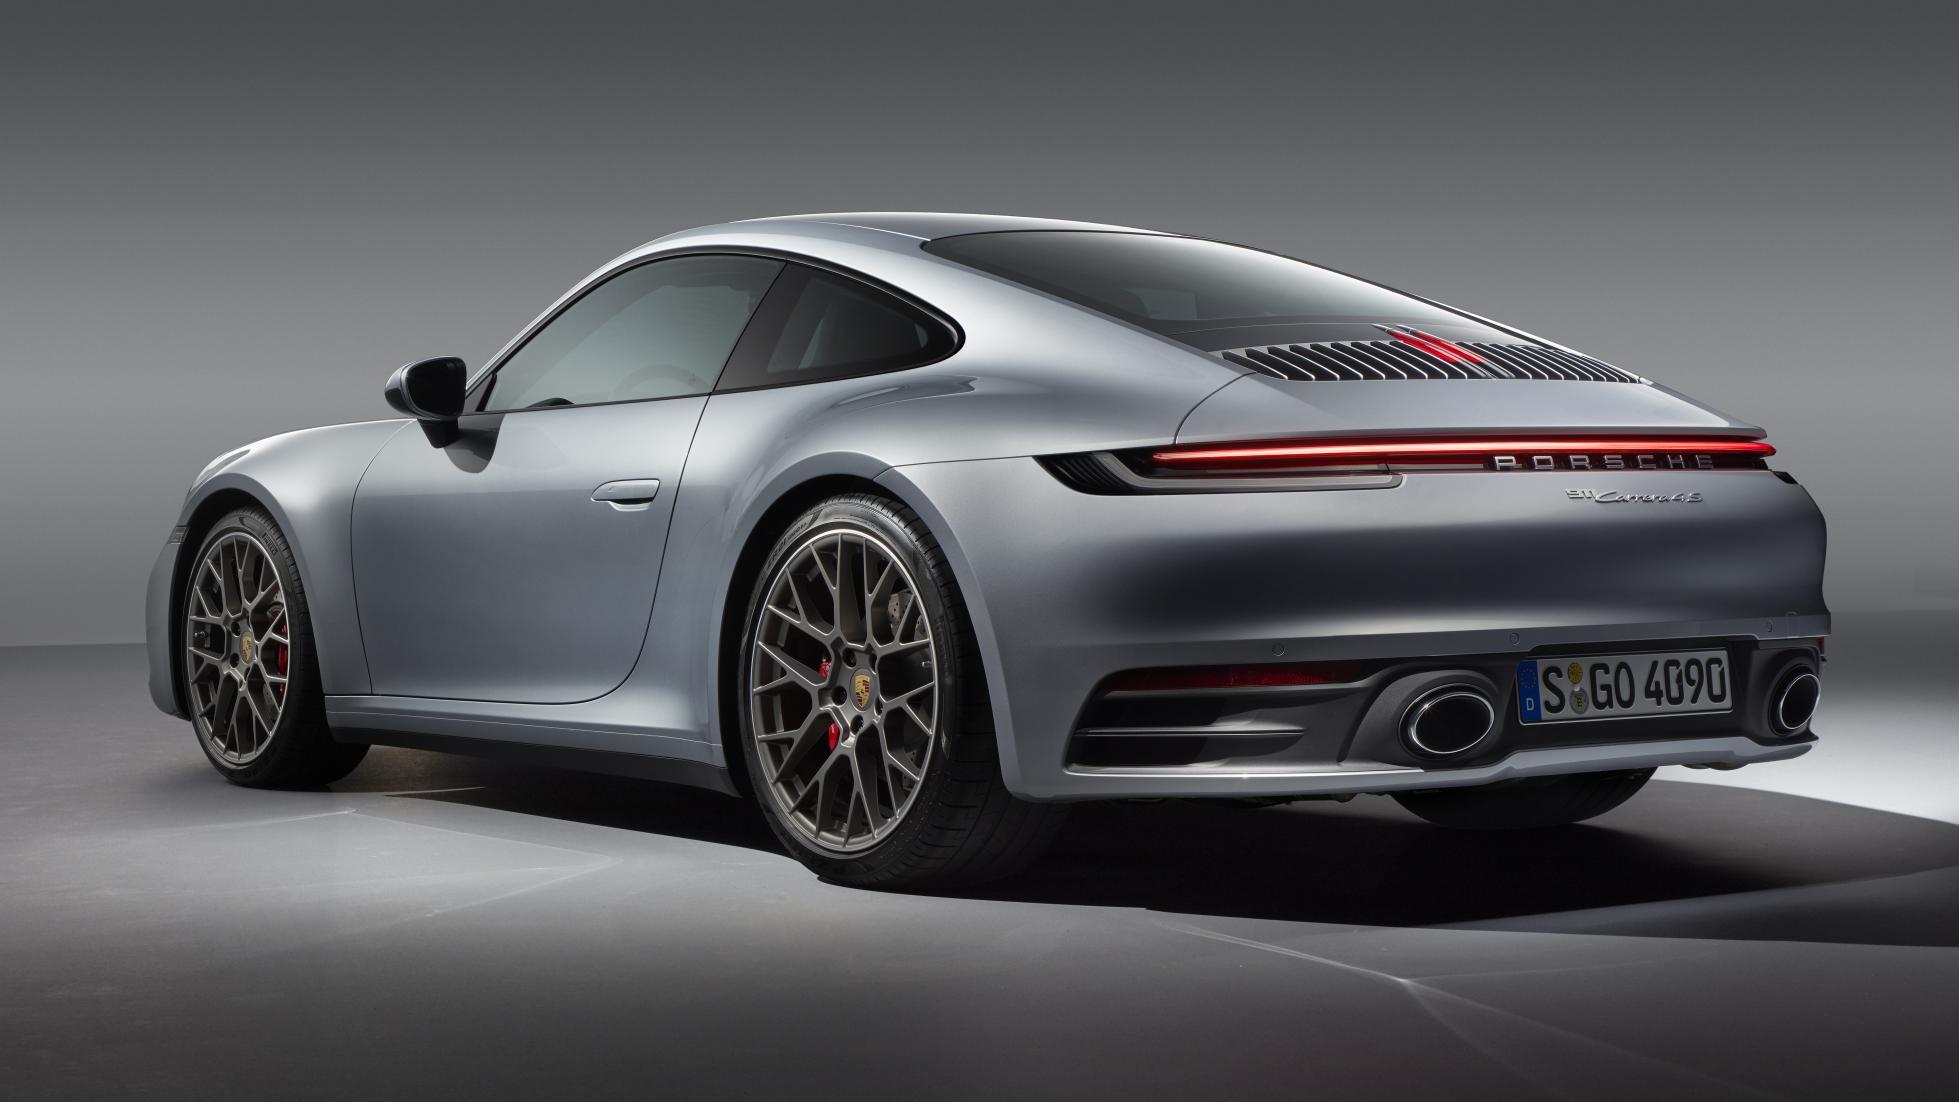 la porsche 911 hybride plus performante que l 39 ancienne turbo s topgear. Black Bedroom Furniture Sets. Home Design Ideas